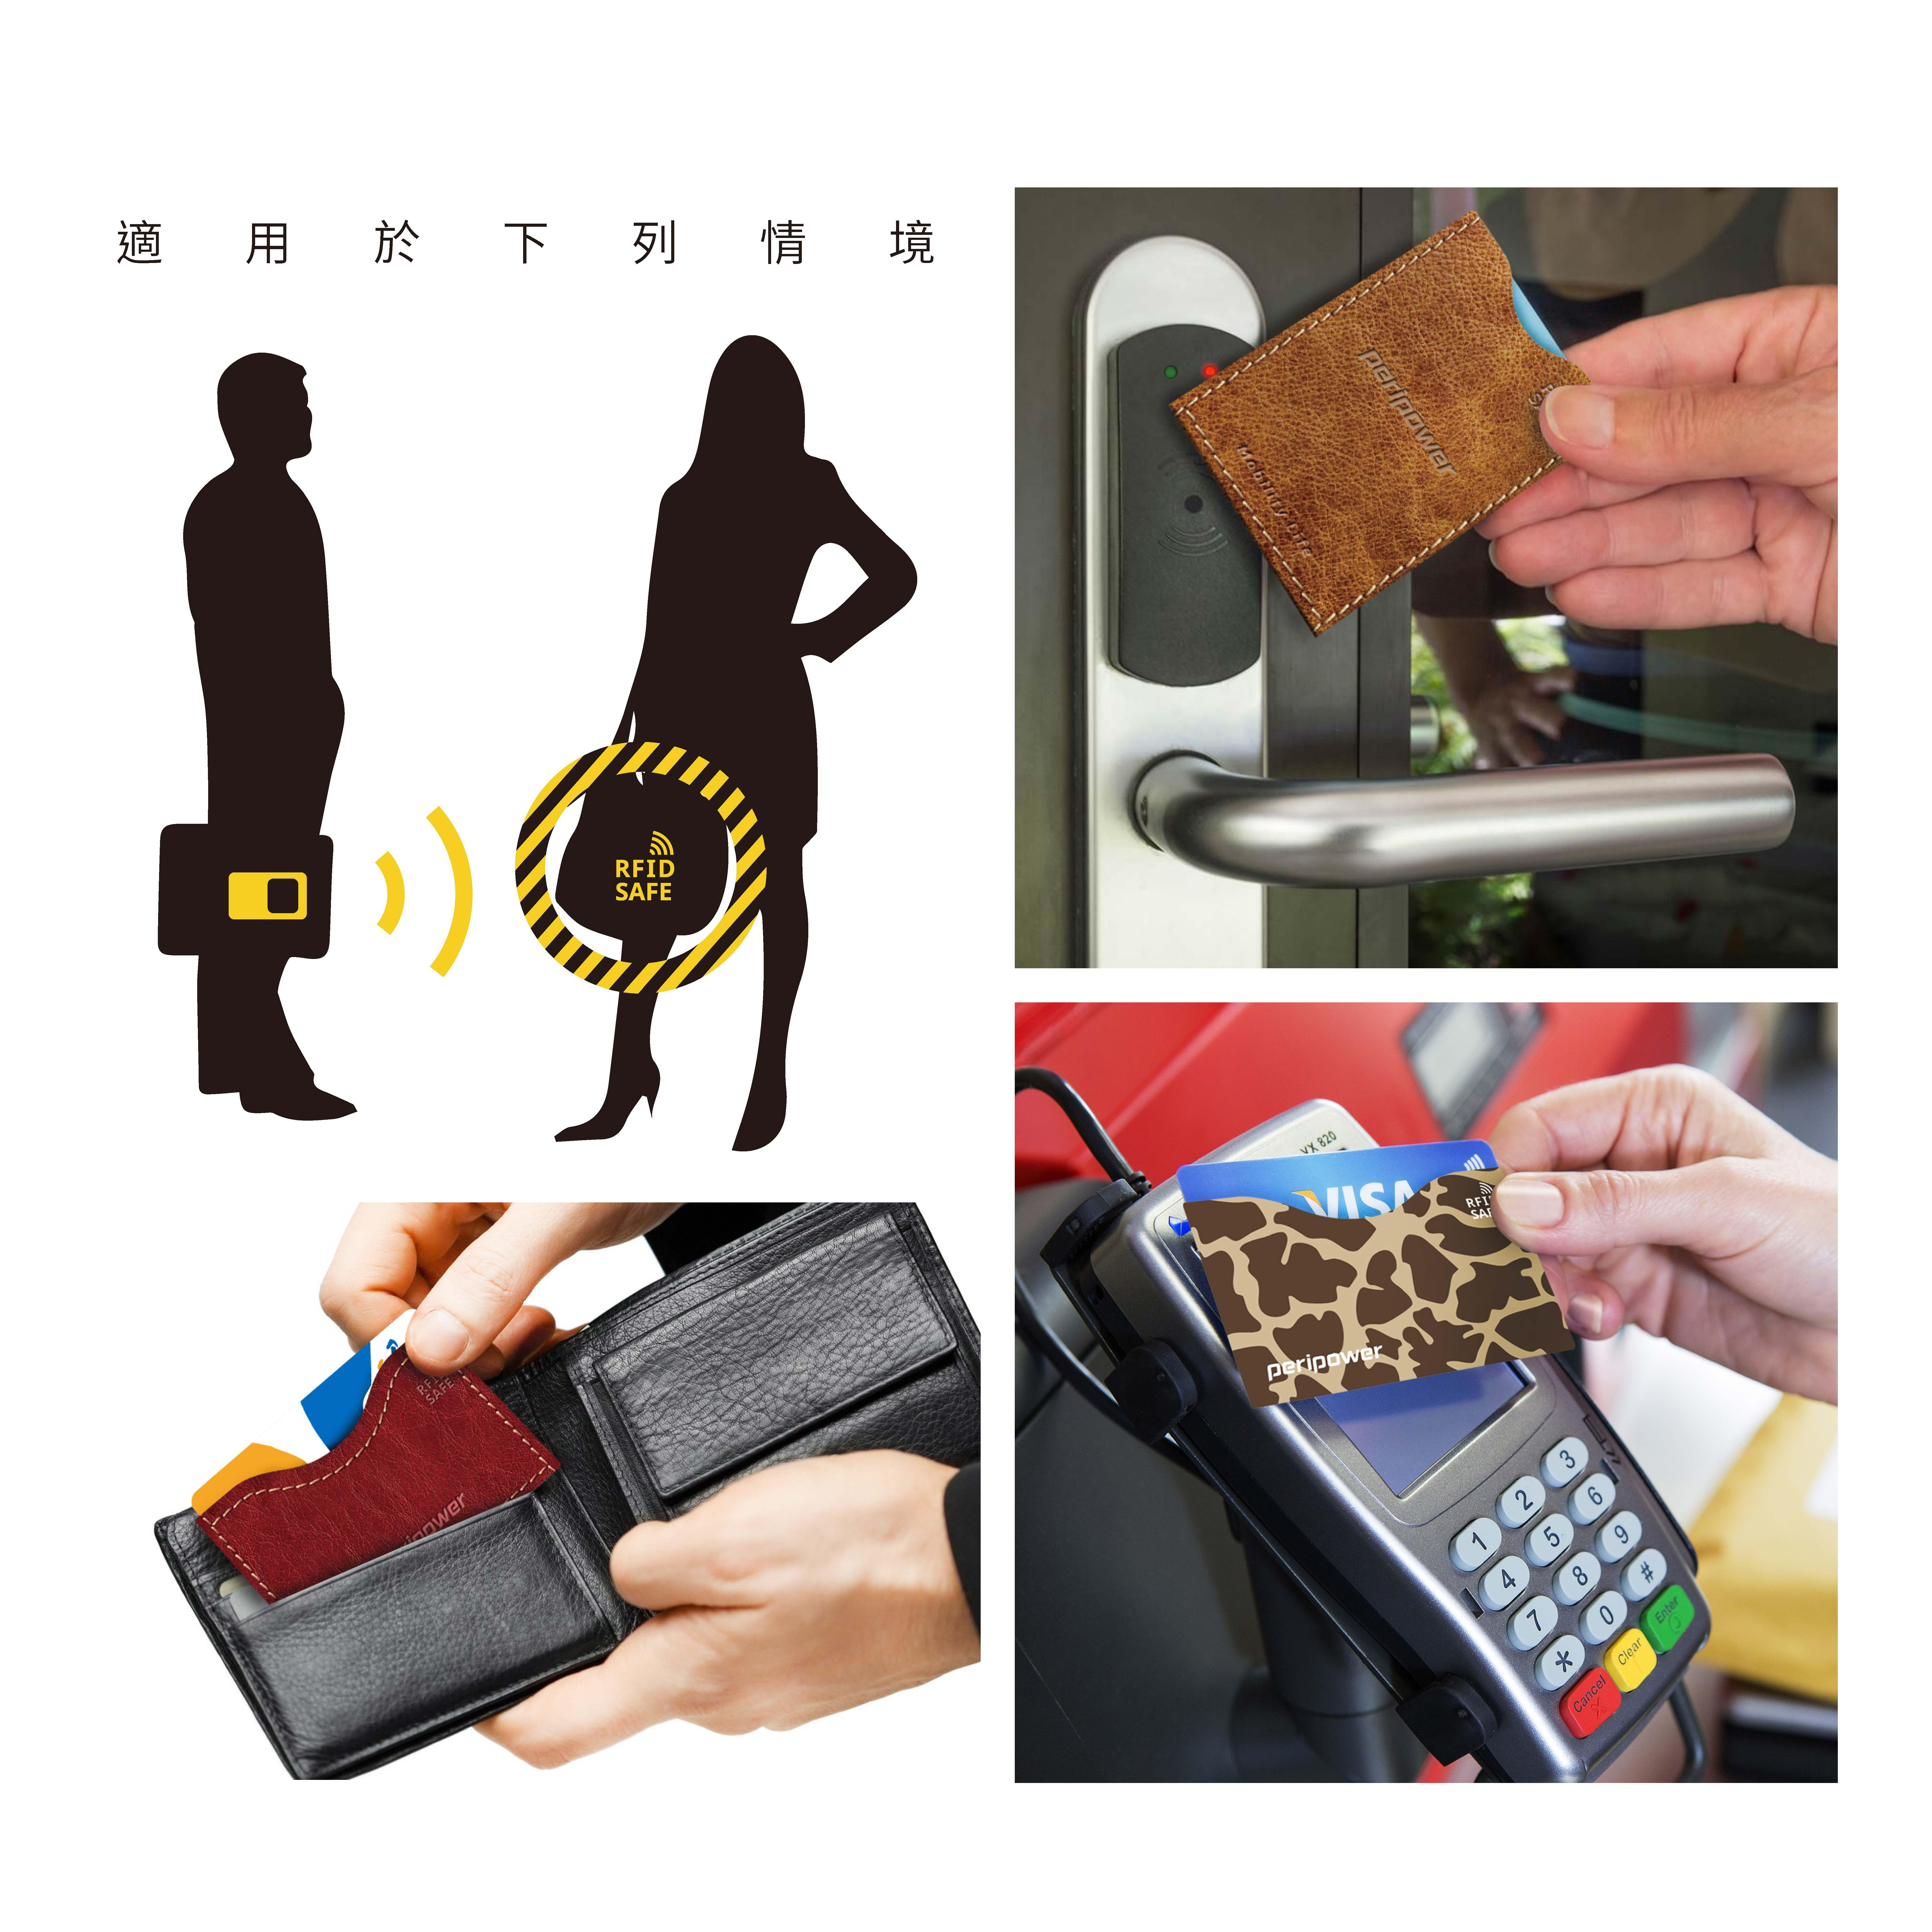 RFID卡安心防護套頁面製作_v1.0_頁面_7